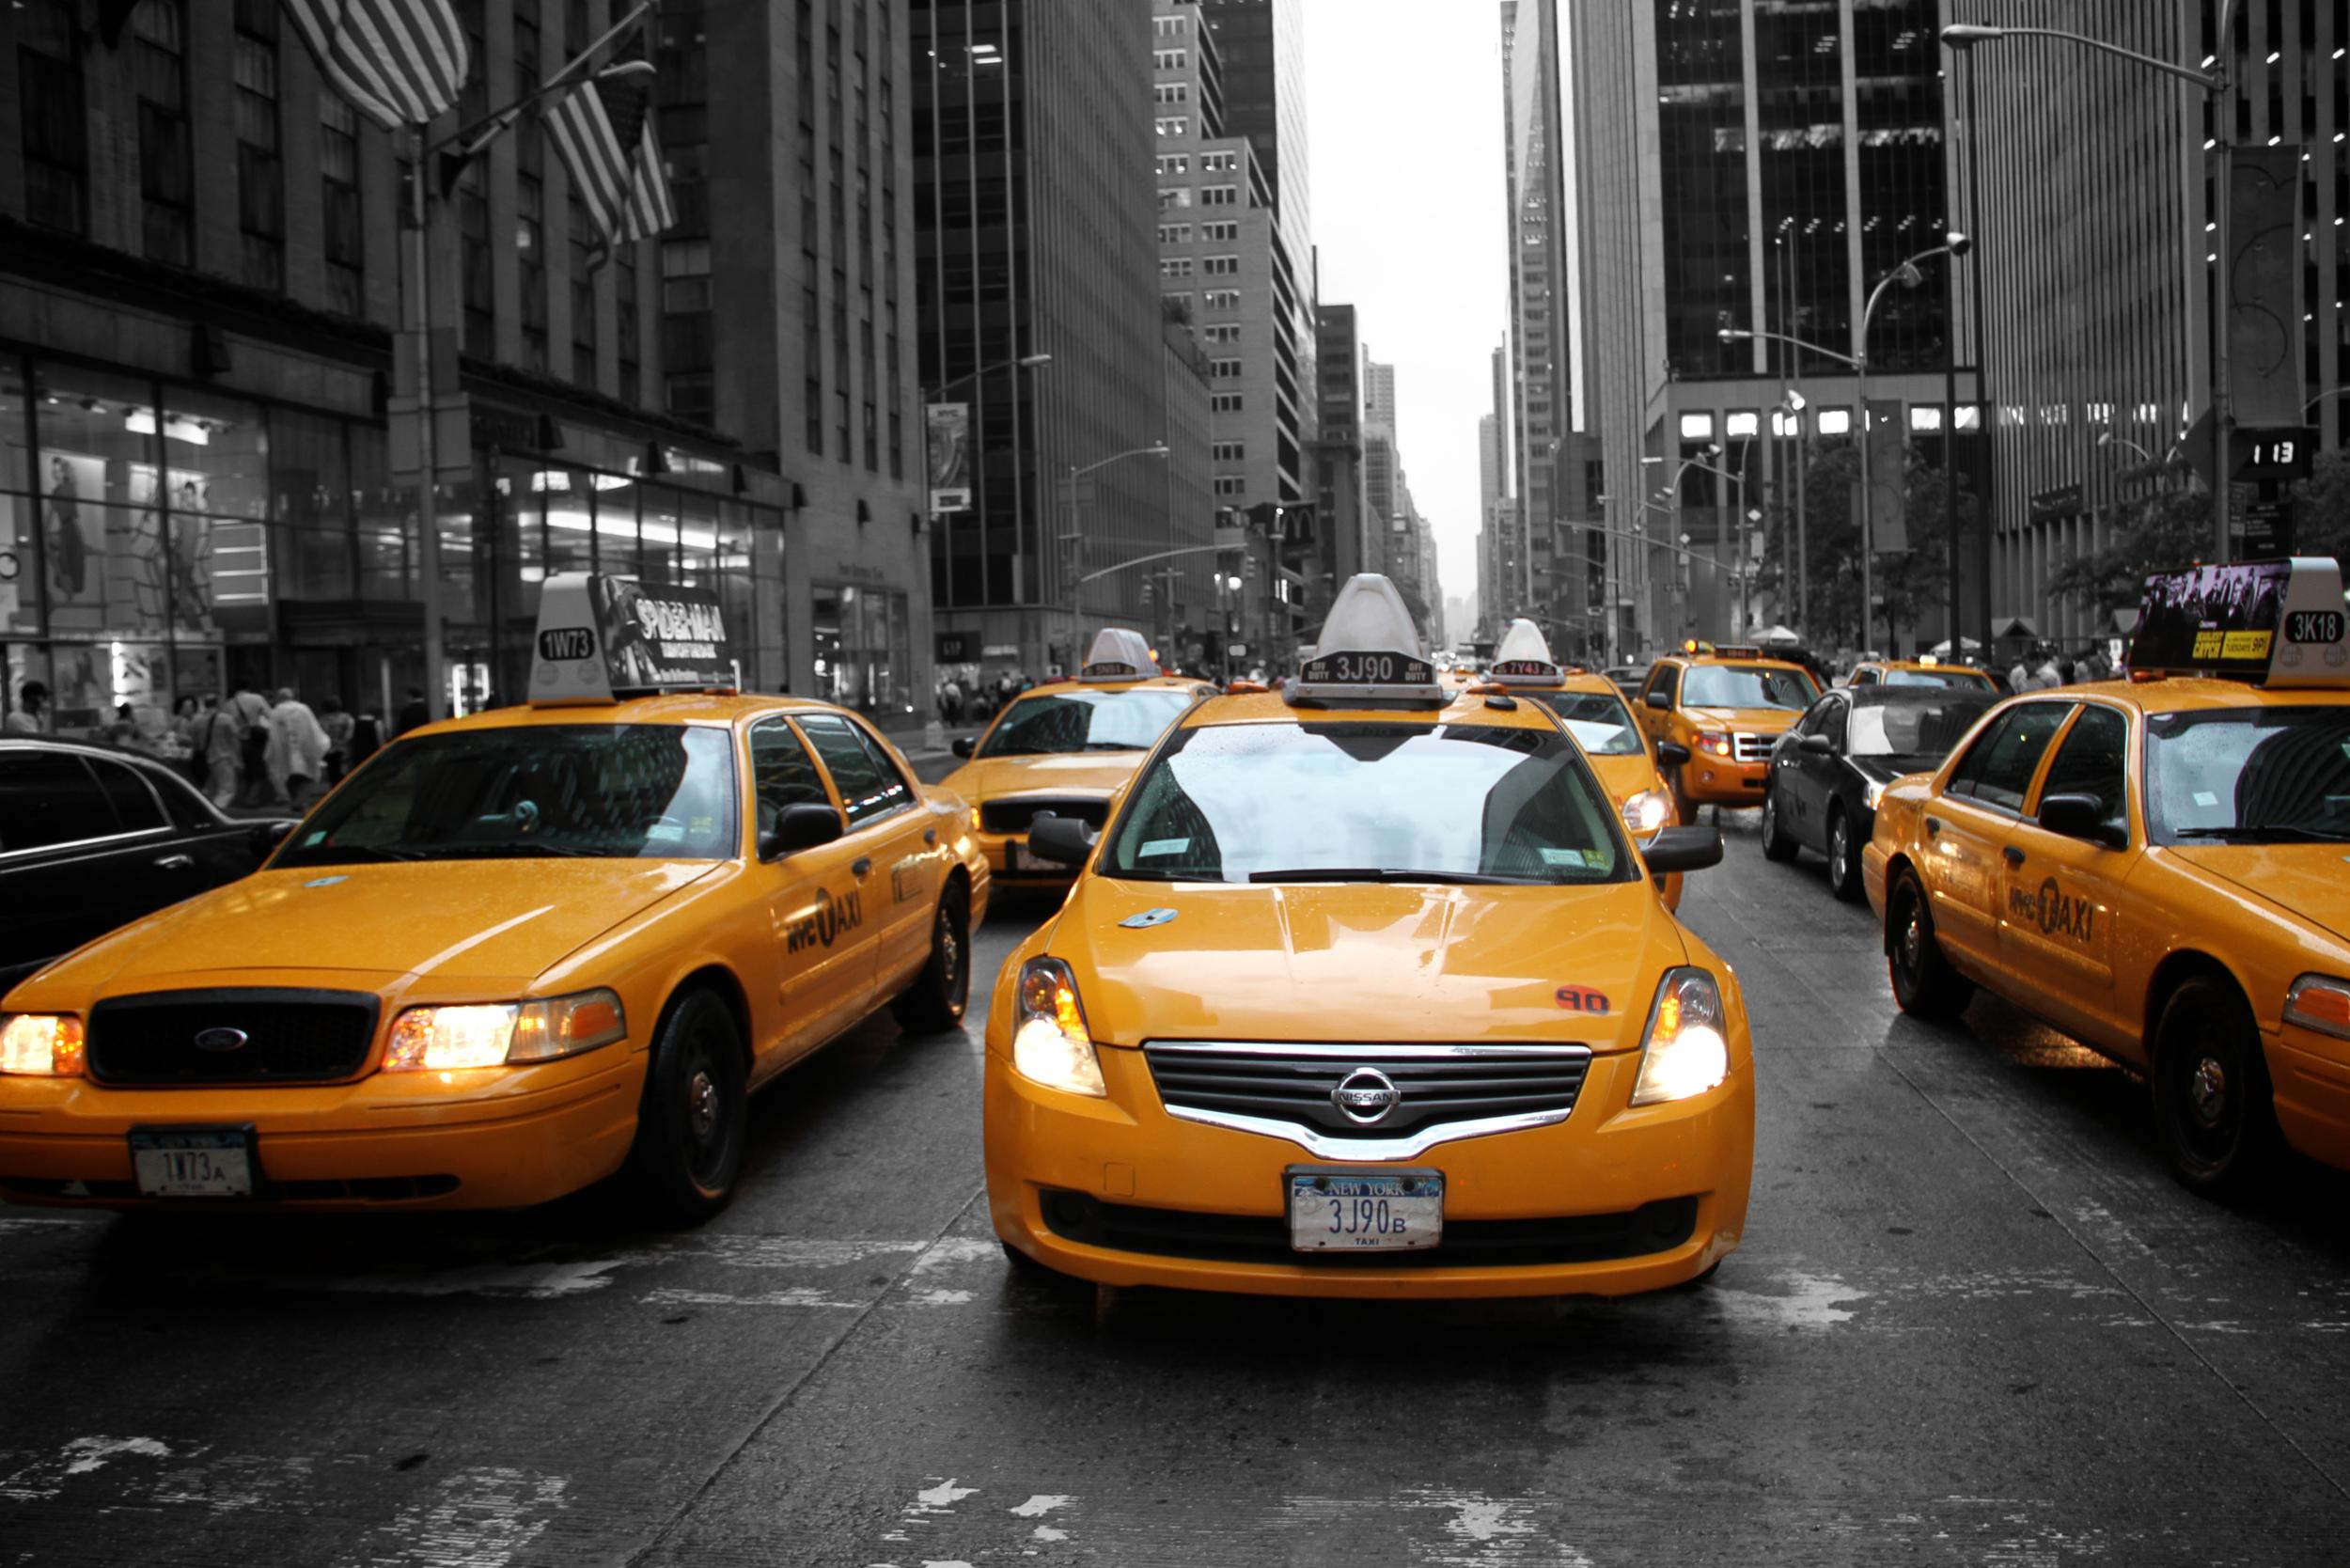 NYC cabs.jpg